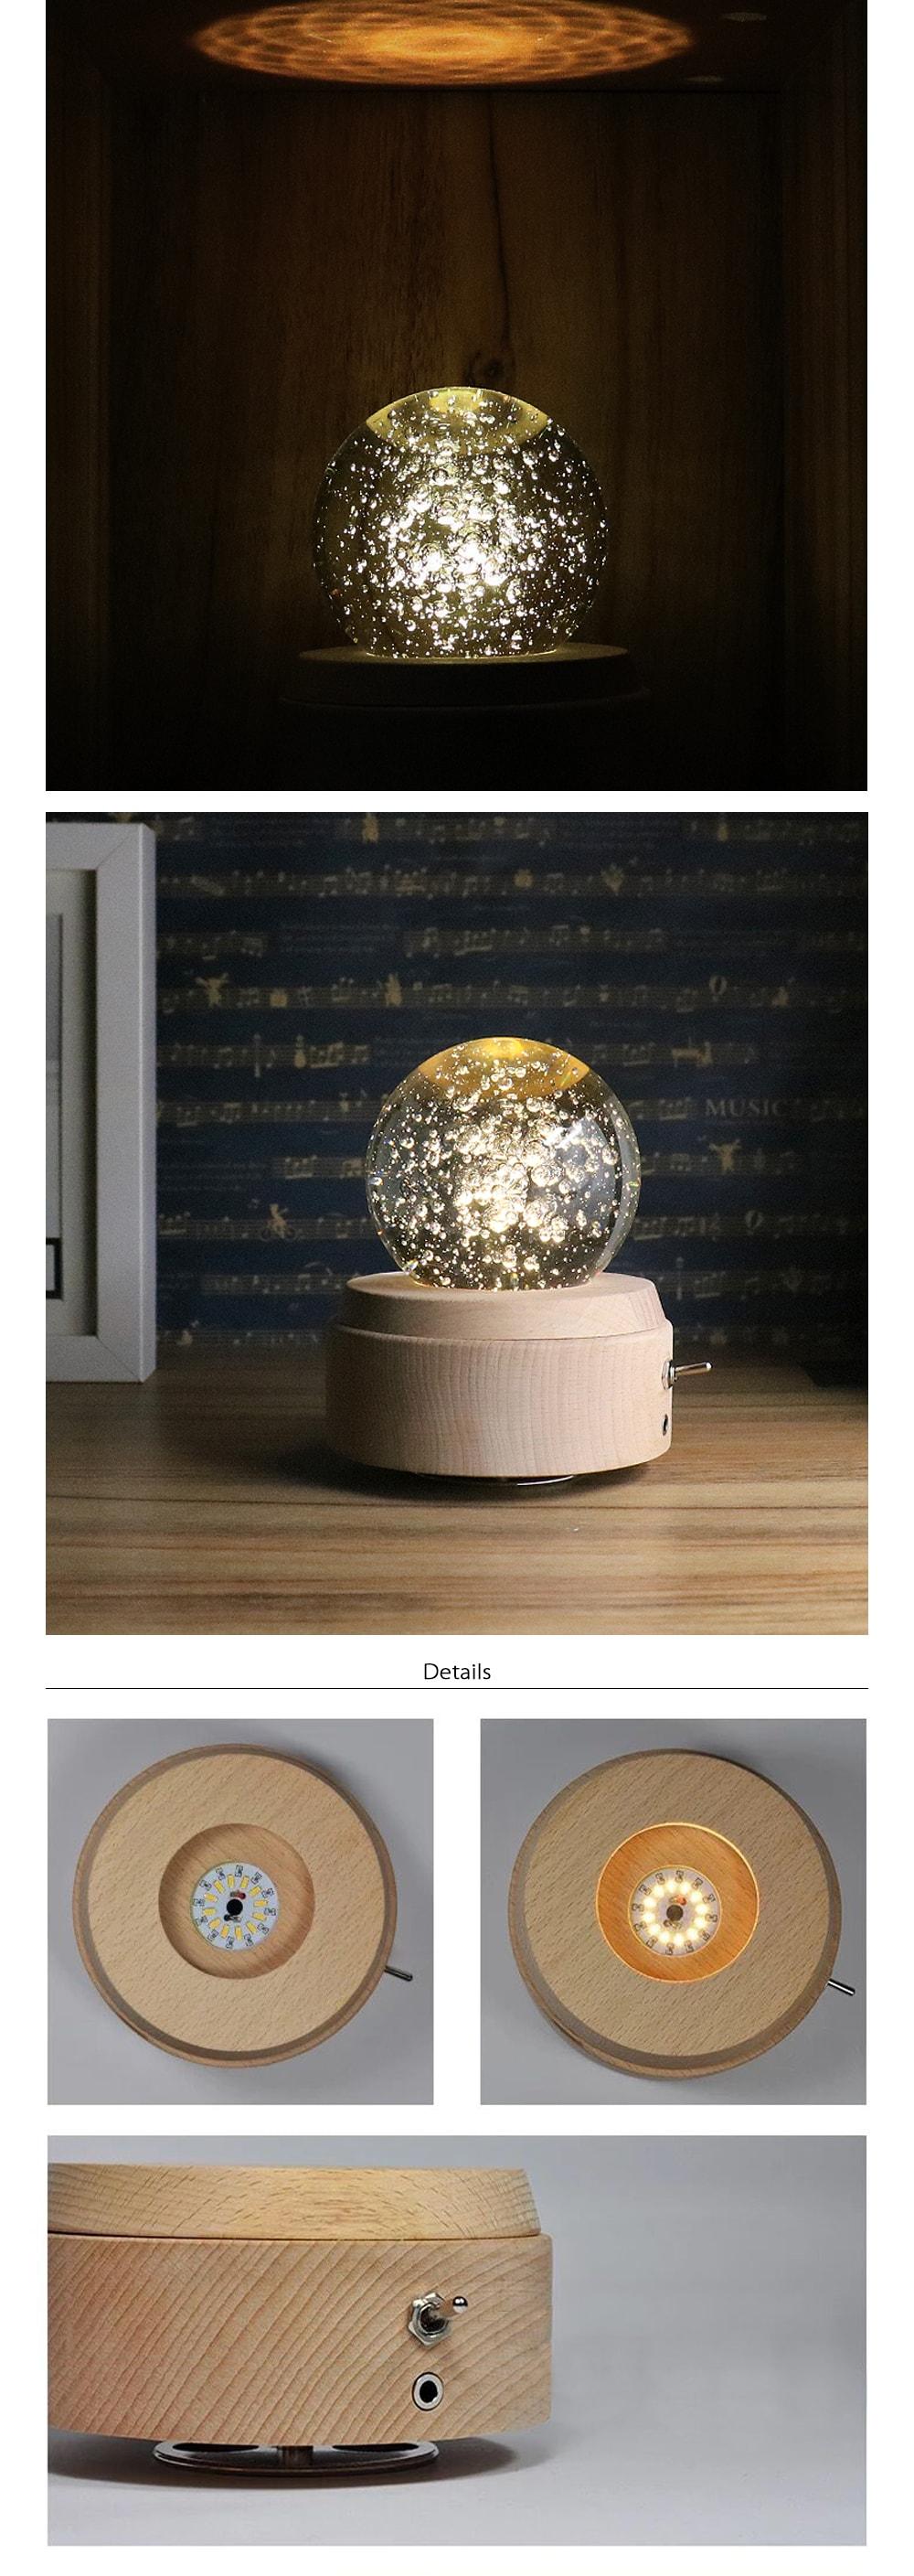 Rotating Music Box Moon Collectioin